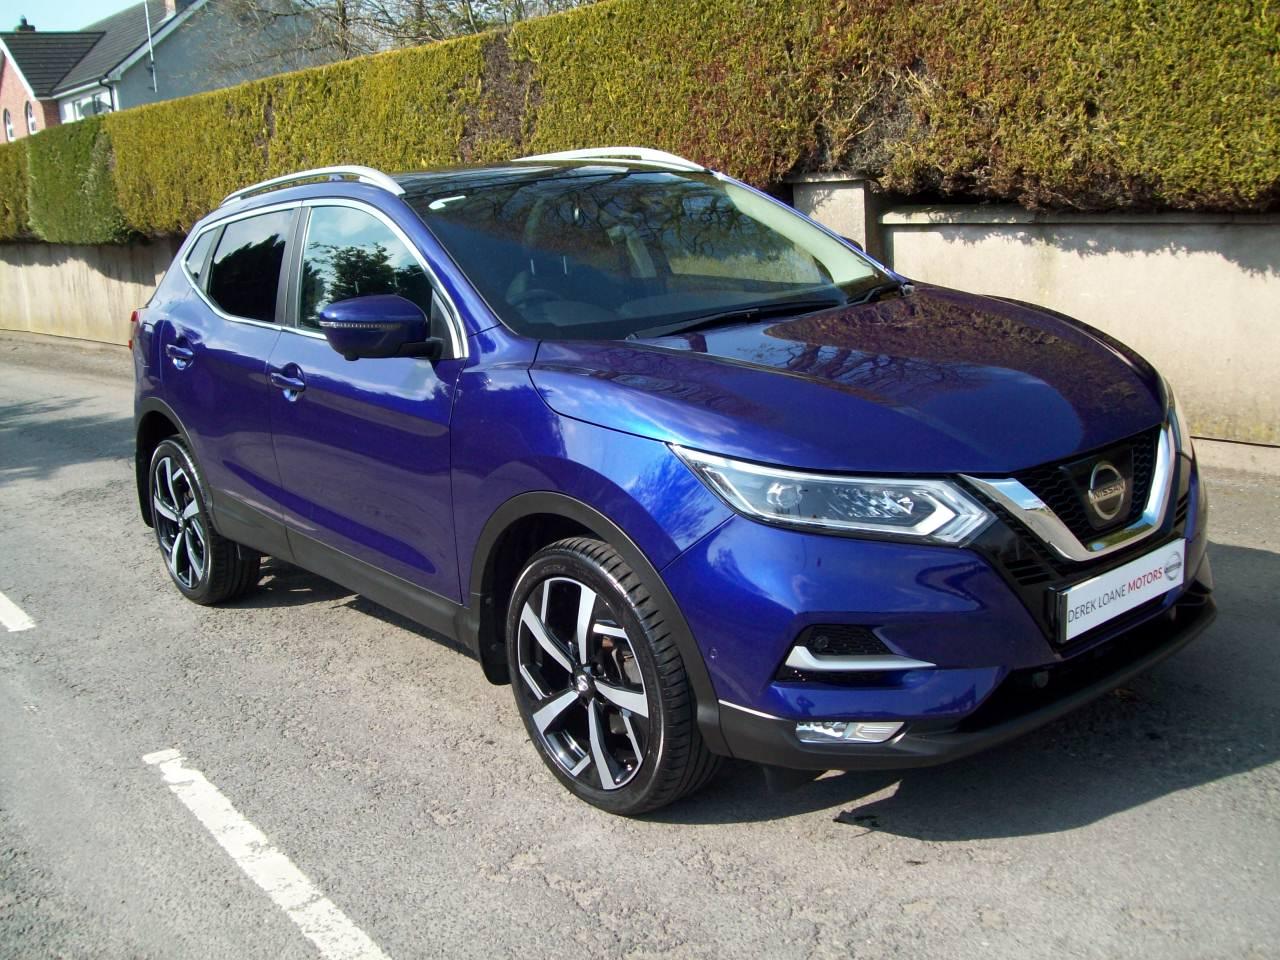 2018 Nissan Qashqai Diesel CVT – Derek Loane Motors